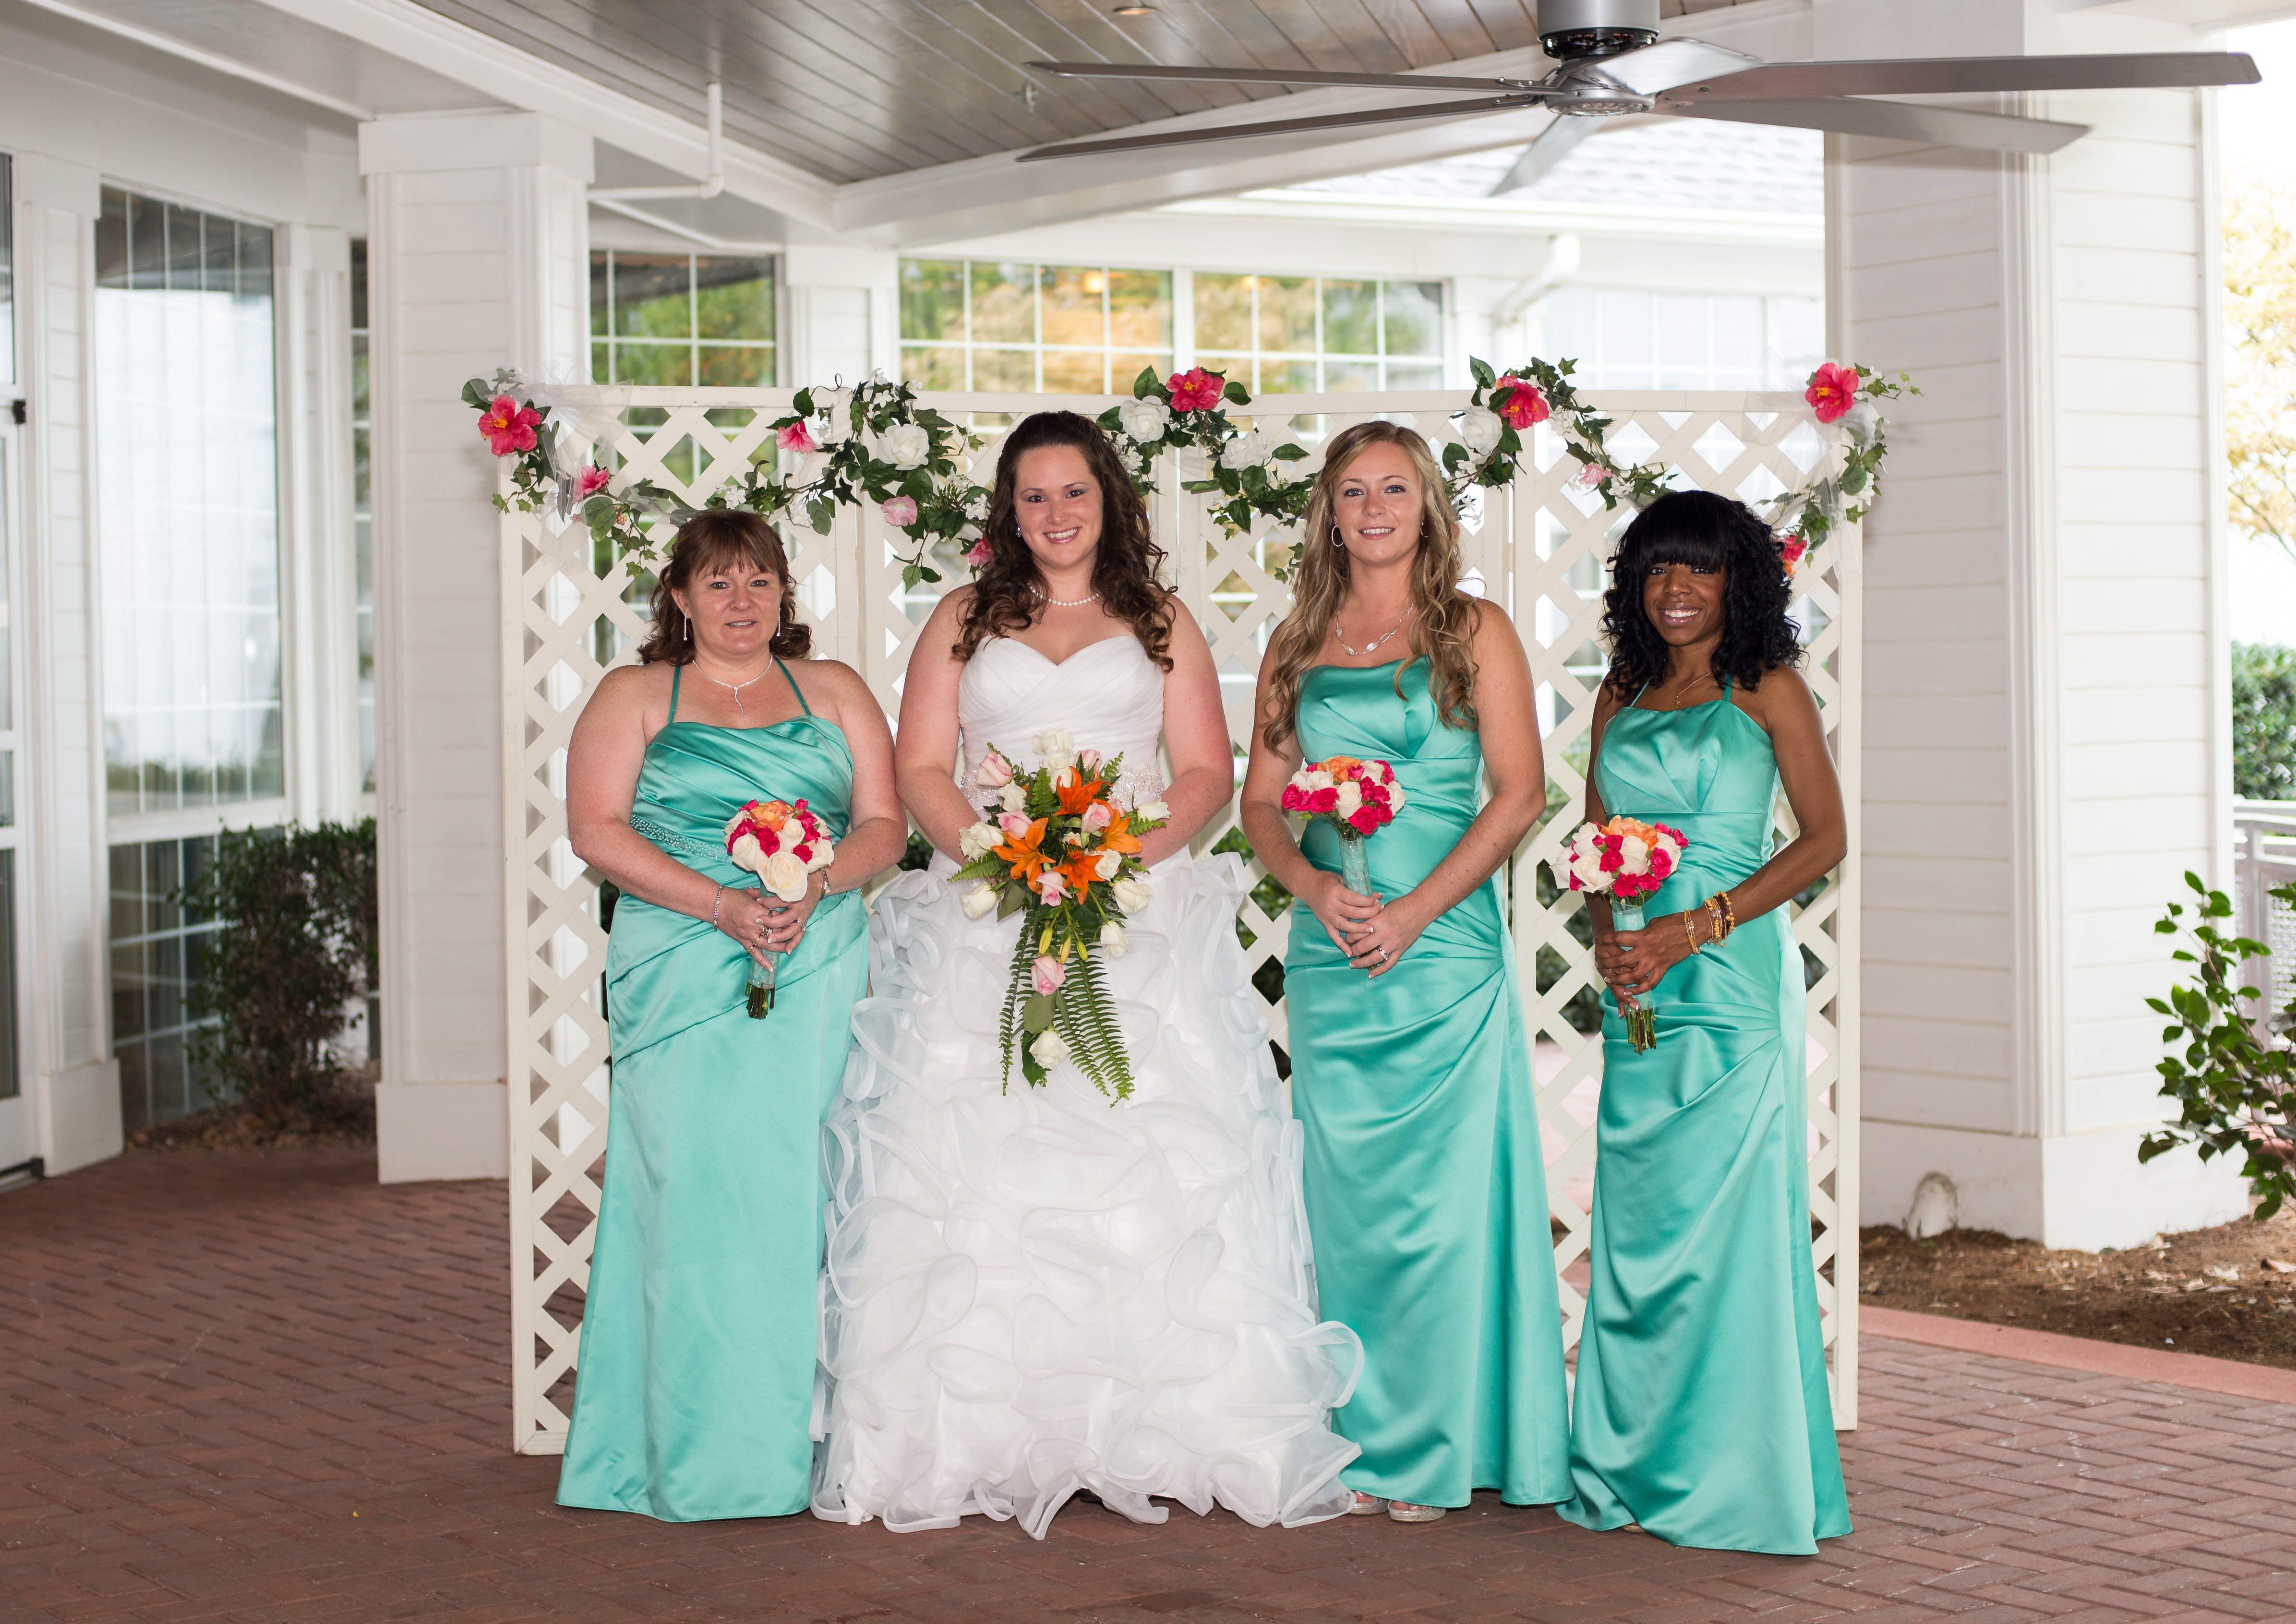 Sea mist color bridesmaid dresses